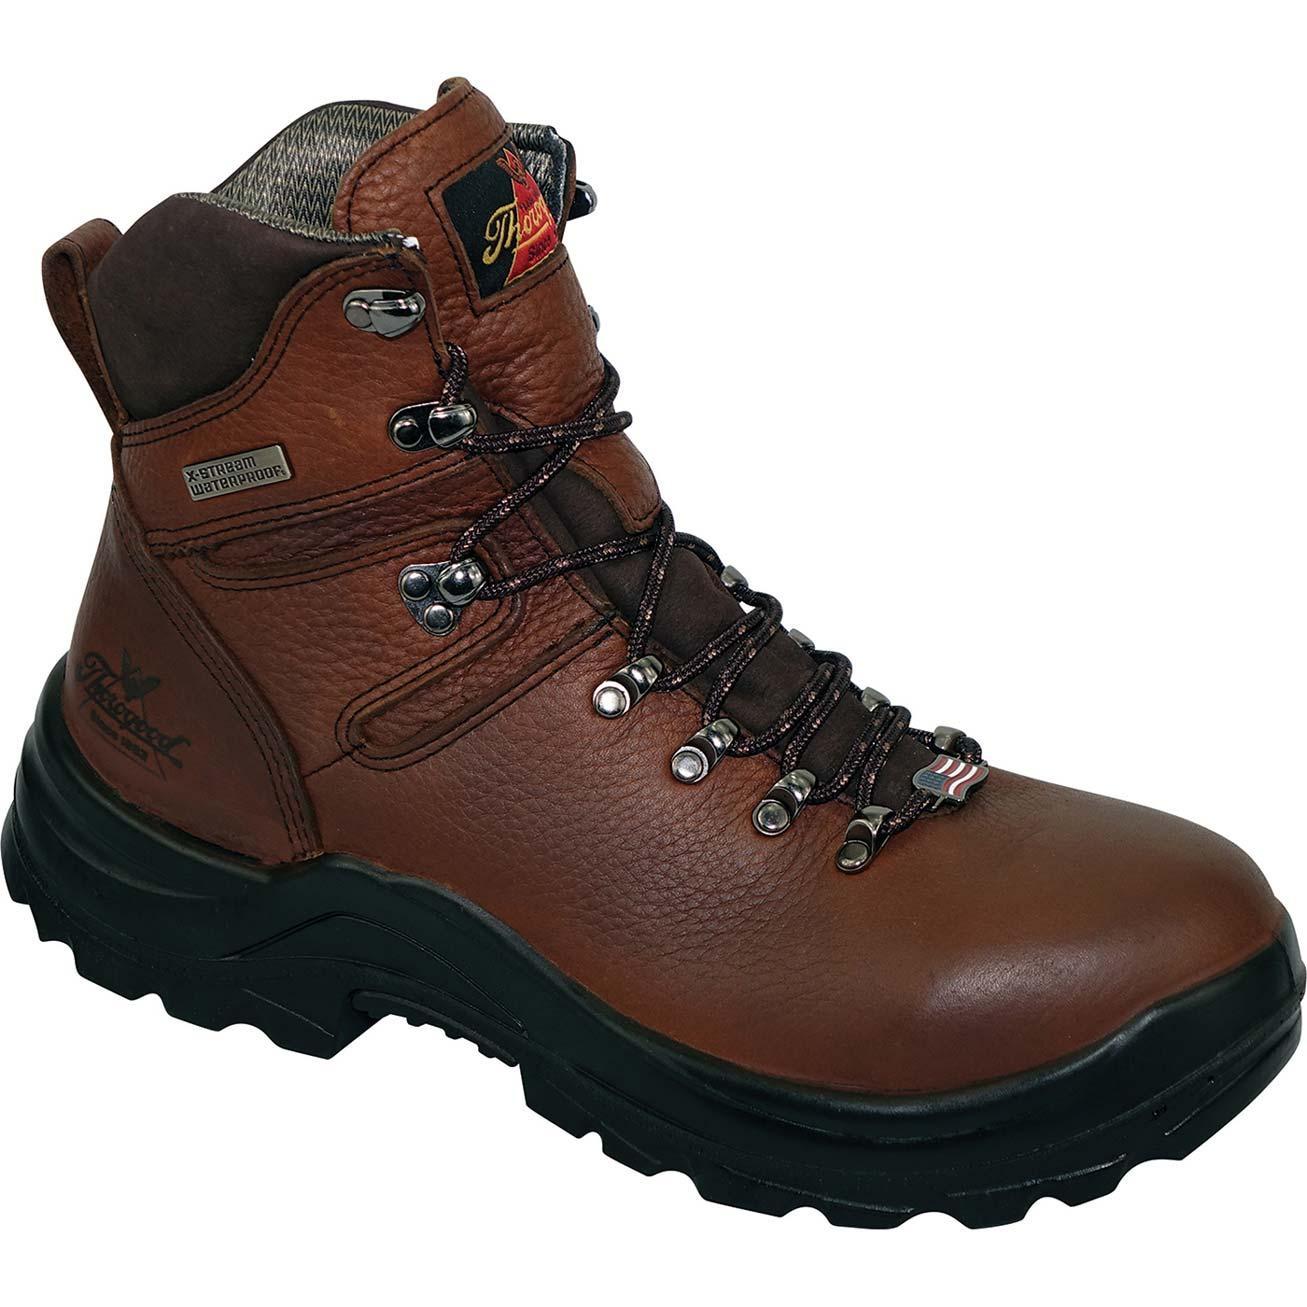 ce9fe6ed58c Thorogood Omni Steel Toe Waterproof Work Boot